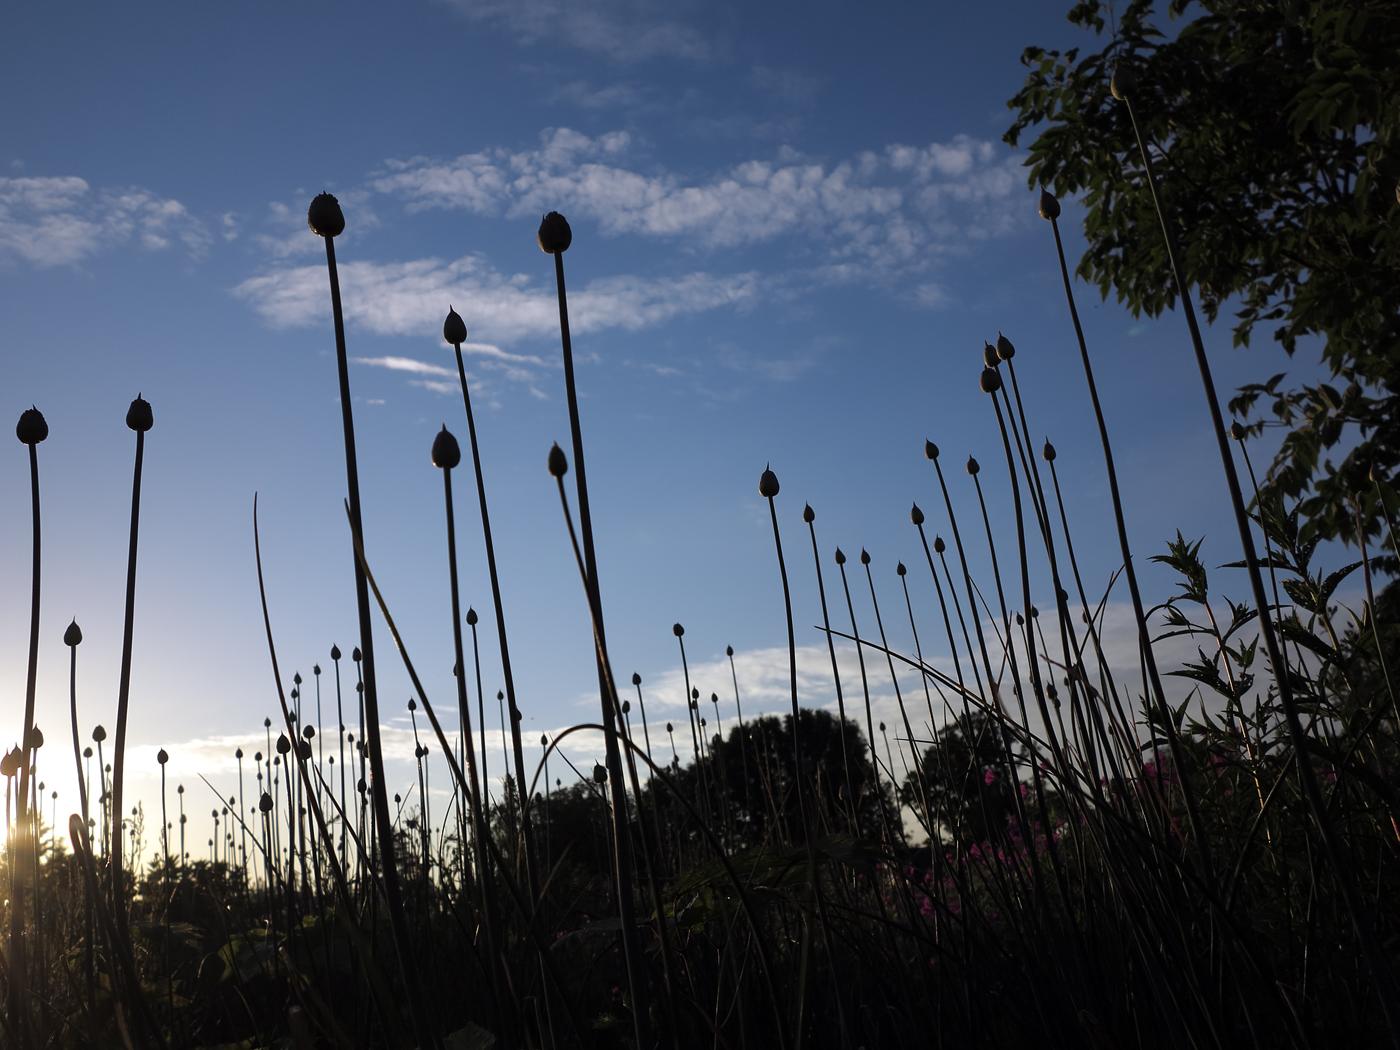 Allium sphaerocephalon aus Froschperspektive